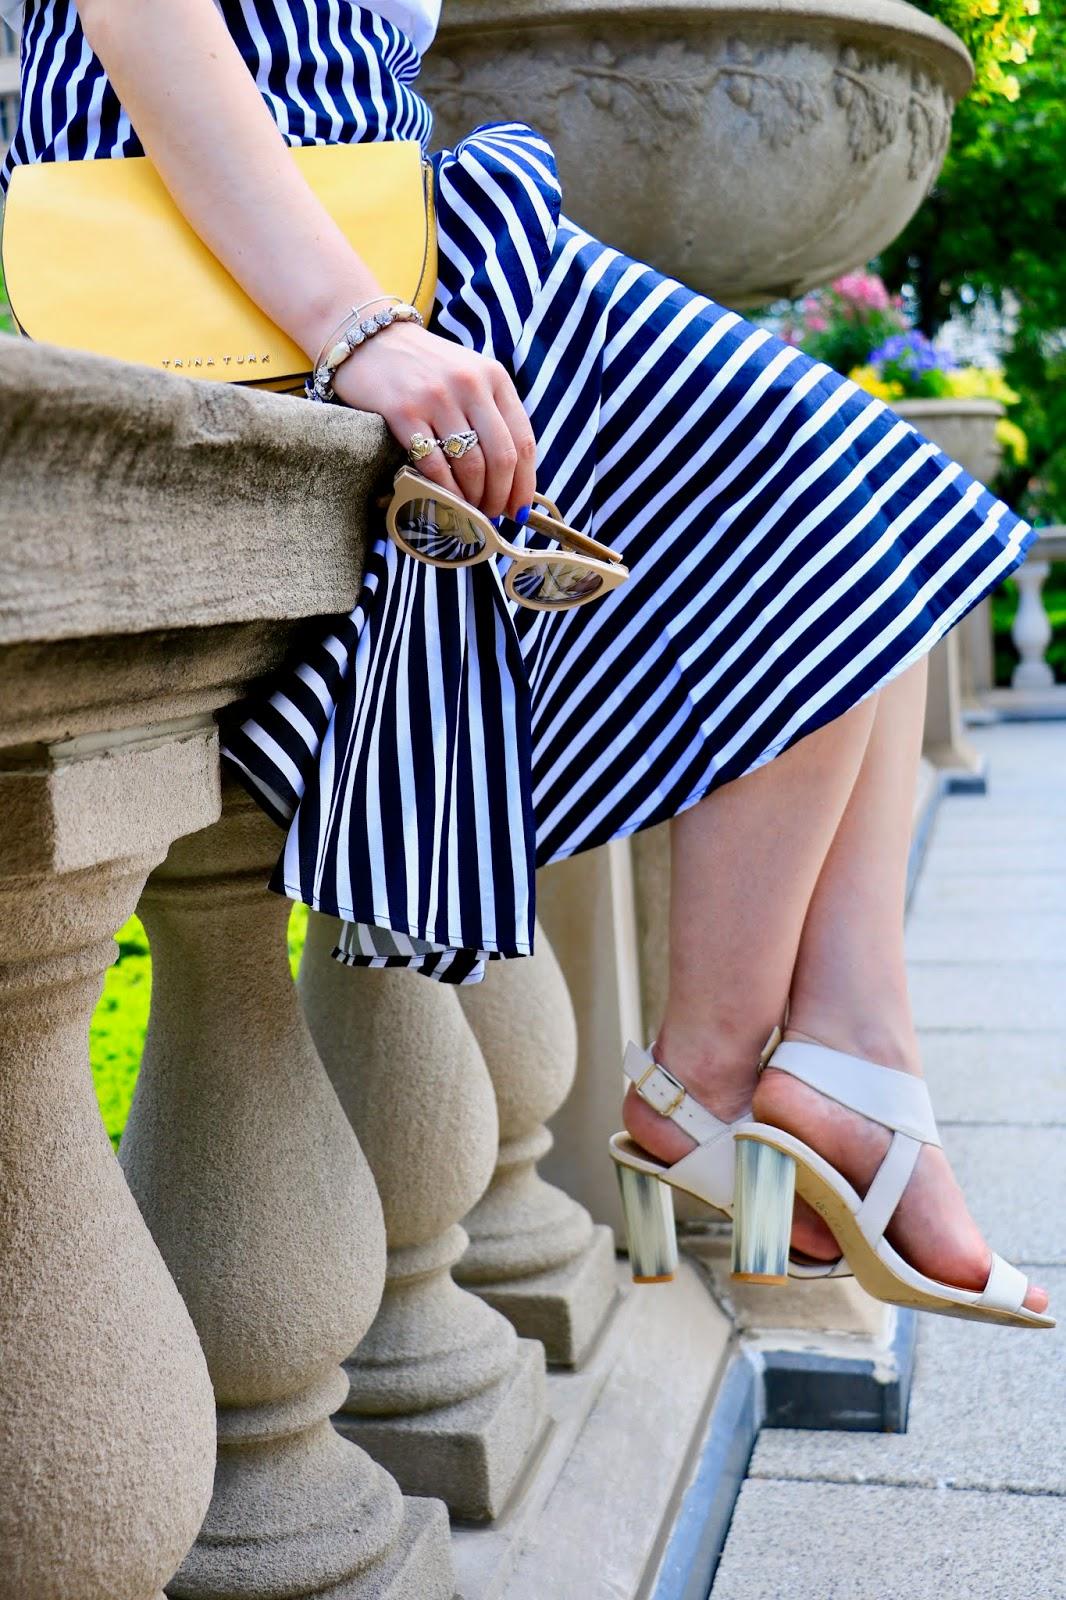 Nyc fashion blogger Kathleen Harper wearing a high-low ruffle skirt from Banana Republic